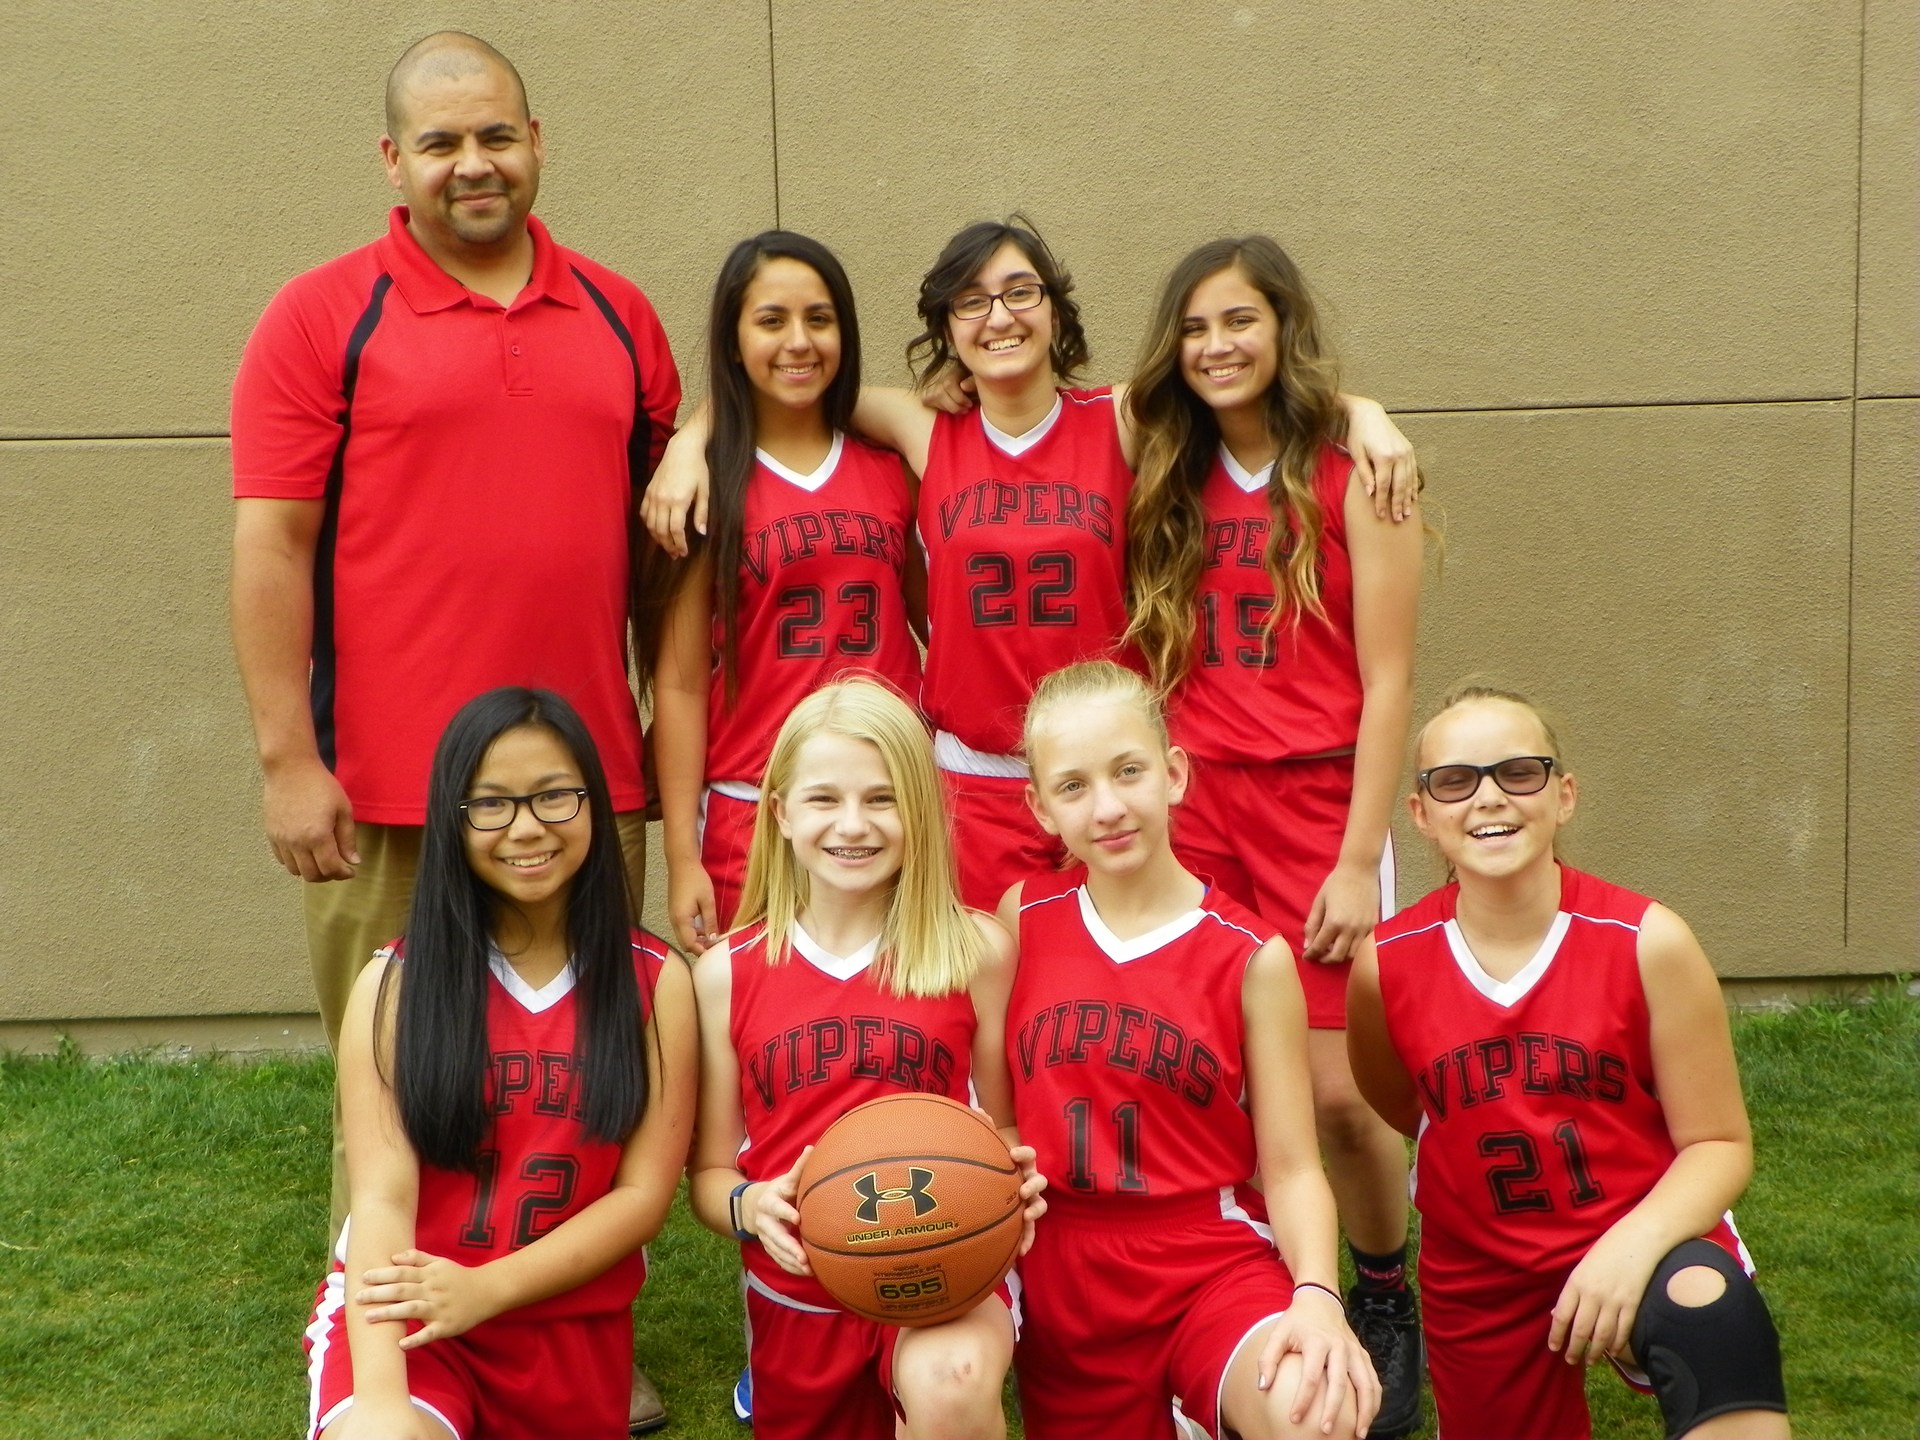 2017 Vipers Girls Basketball